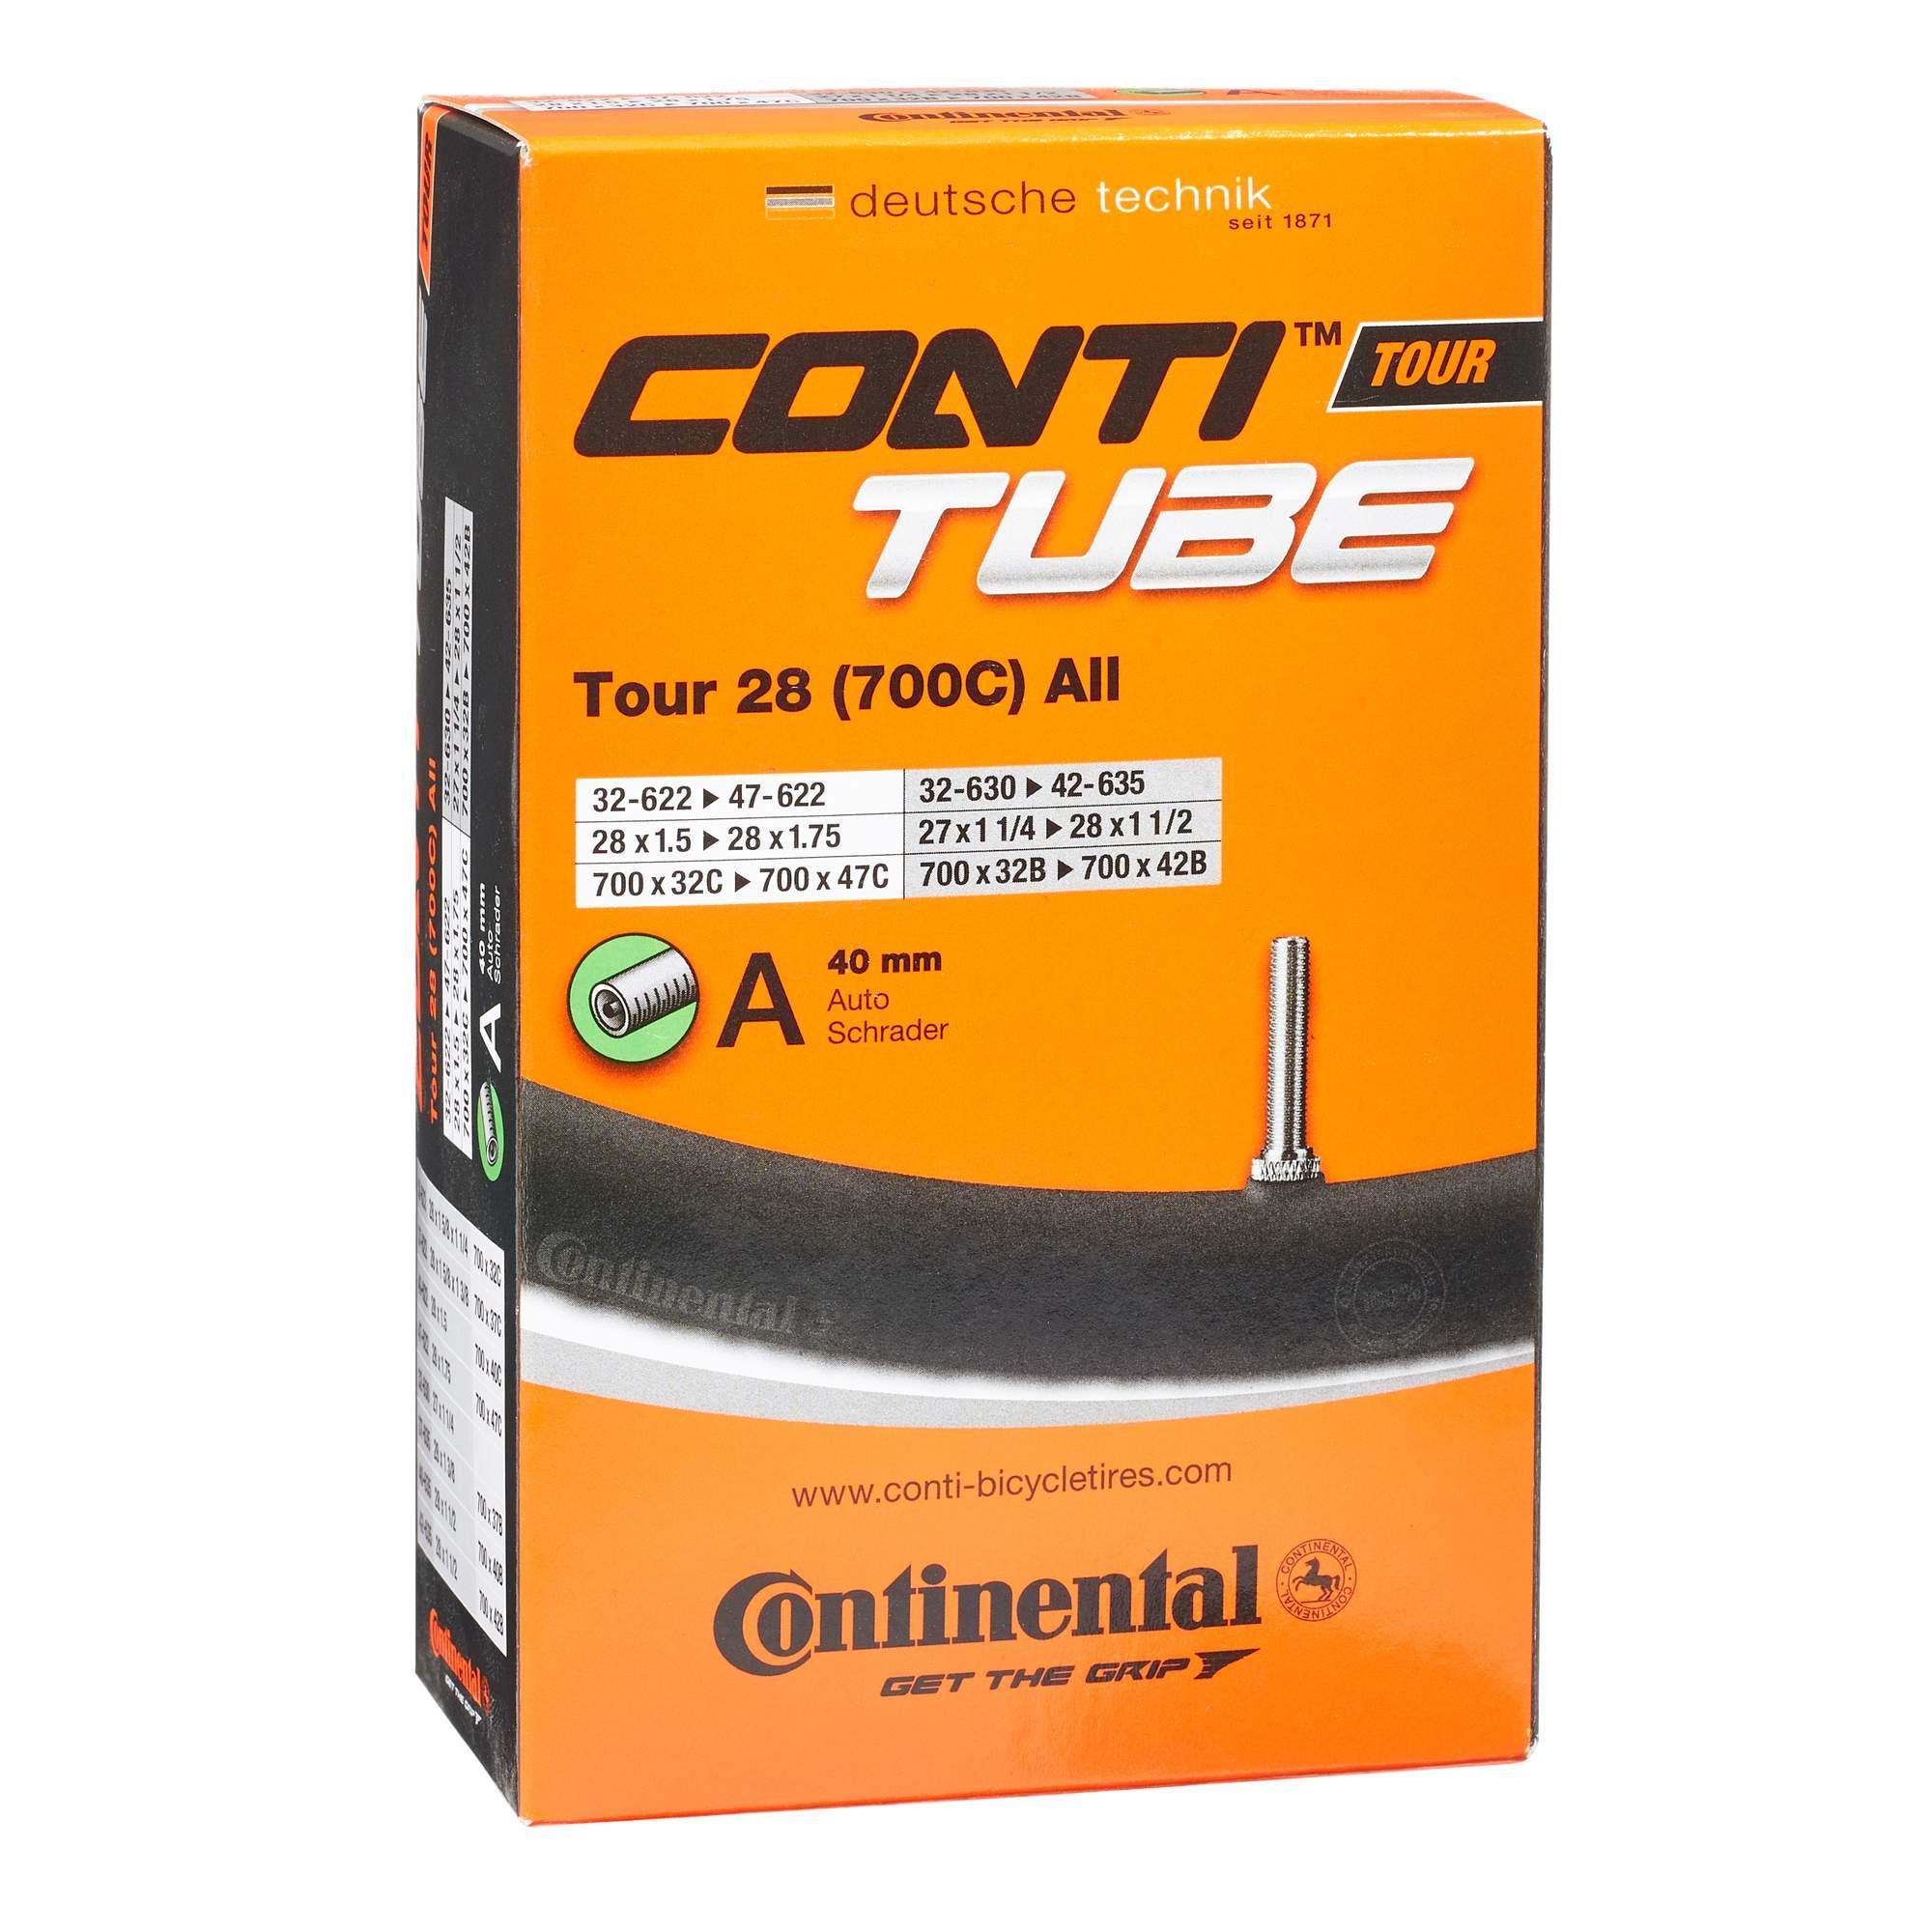 Continental FAHRRADSCHLAUCH TOUR 28 ZOLL 32-47 (AV) - Fahrradschlauch - orange